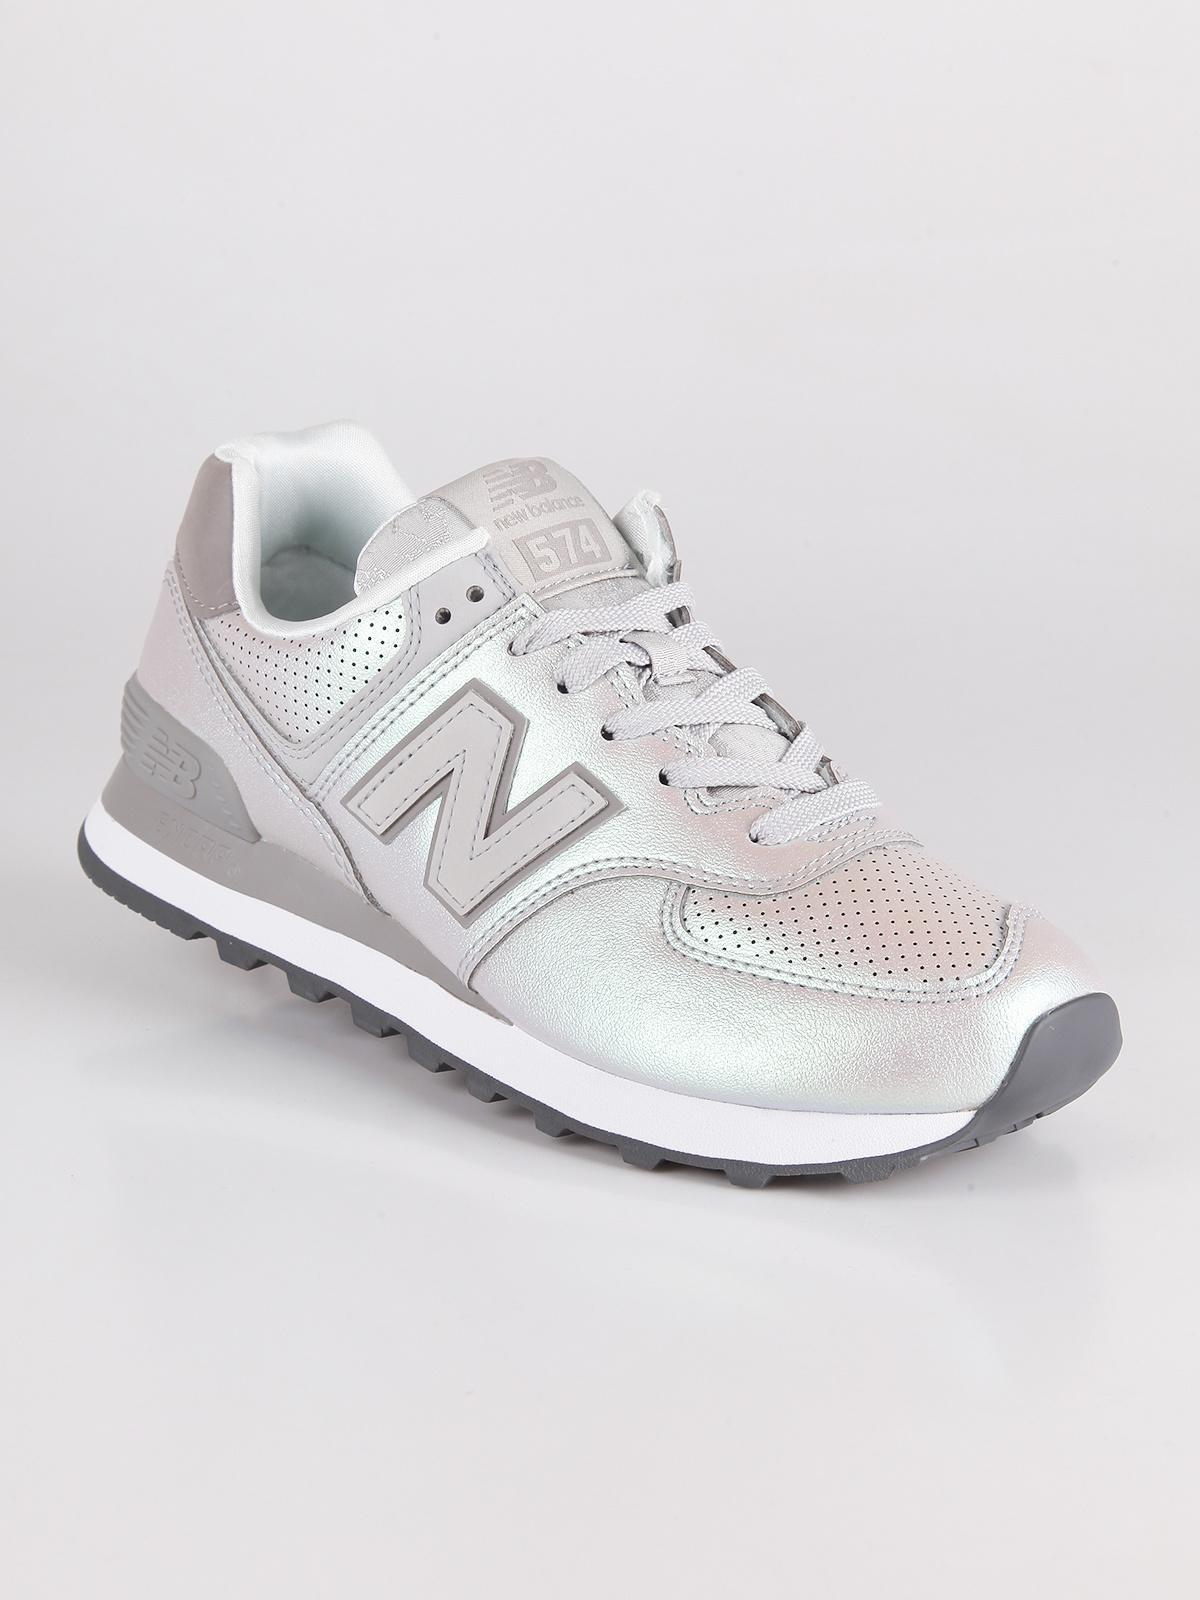 new balance donna pelle bianca argento